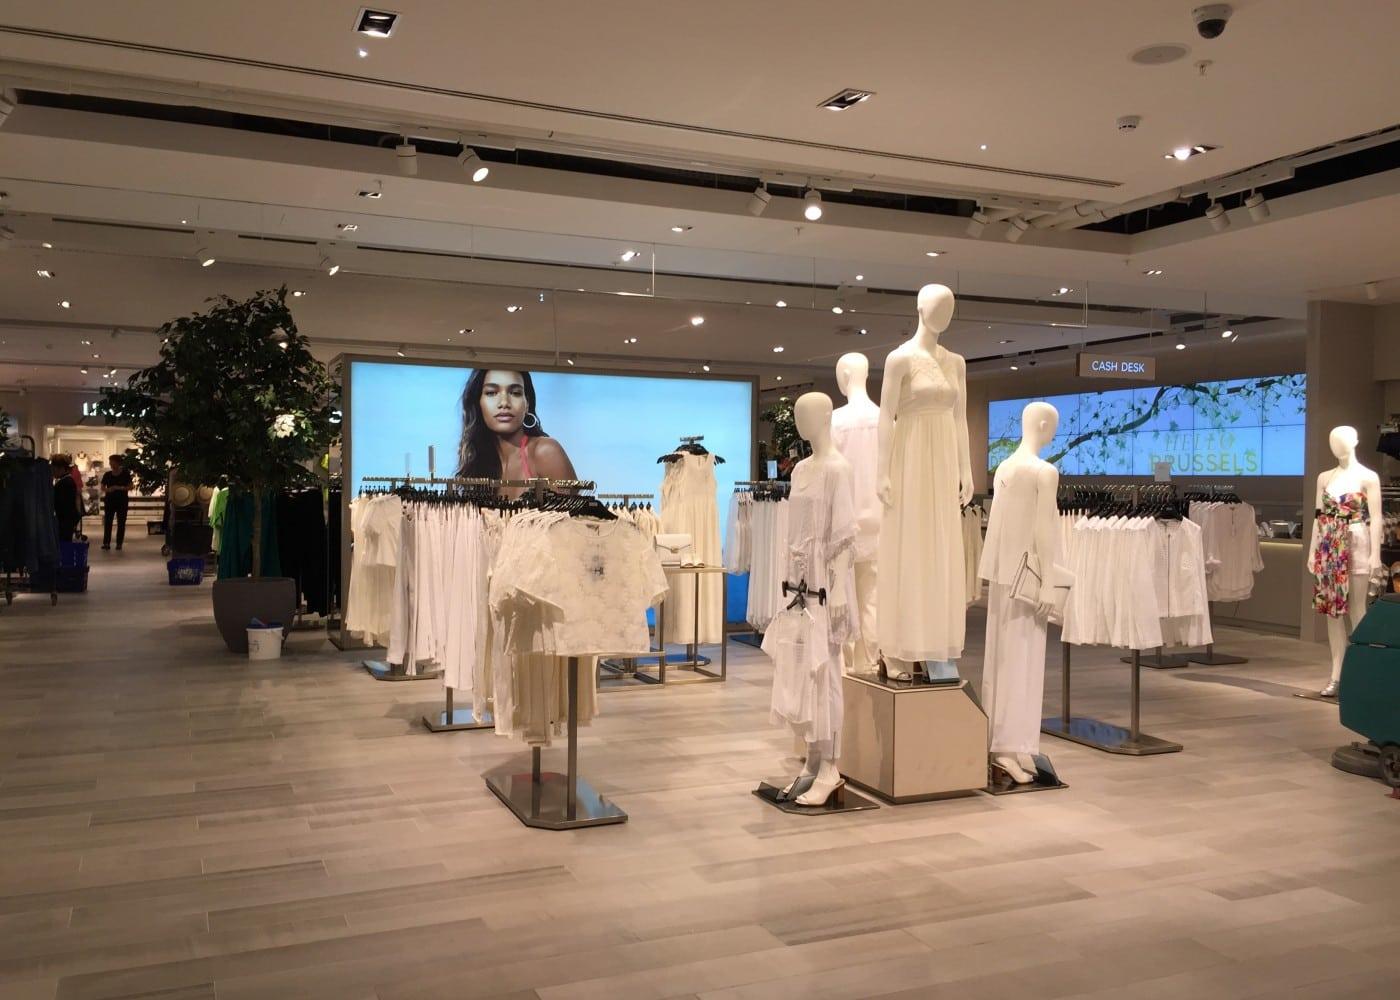 retail lighting design: womenswear department